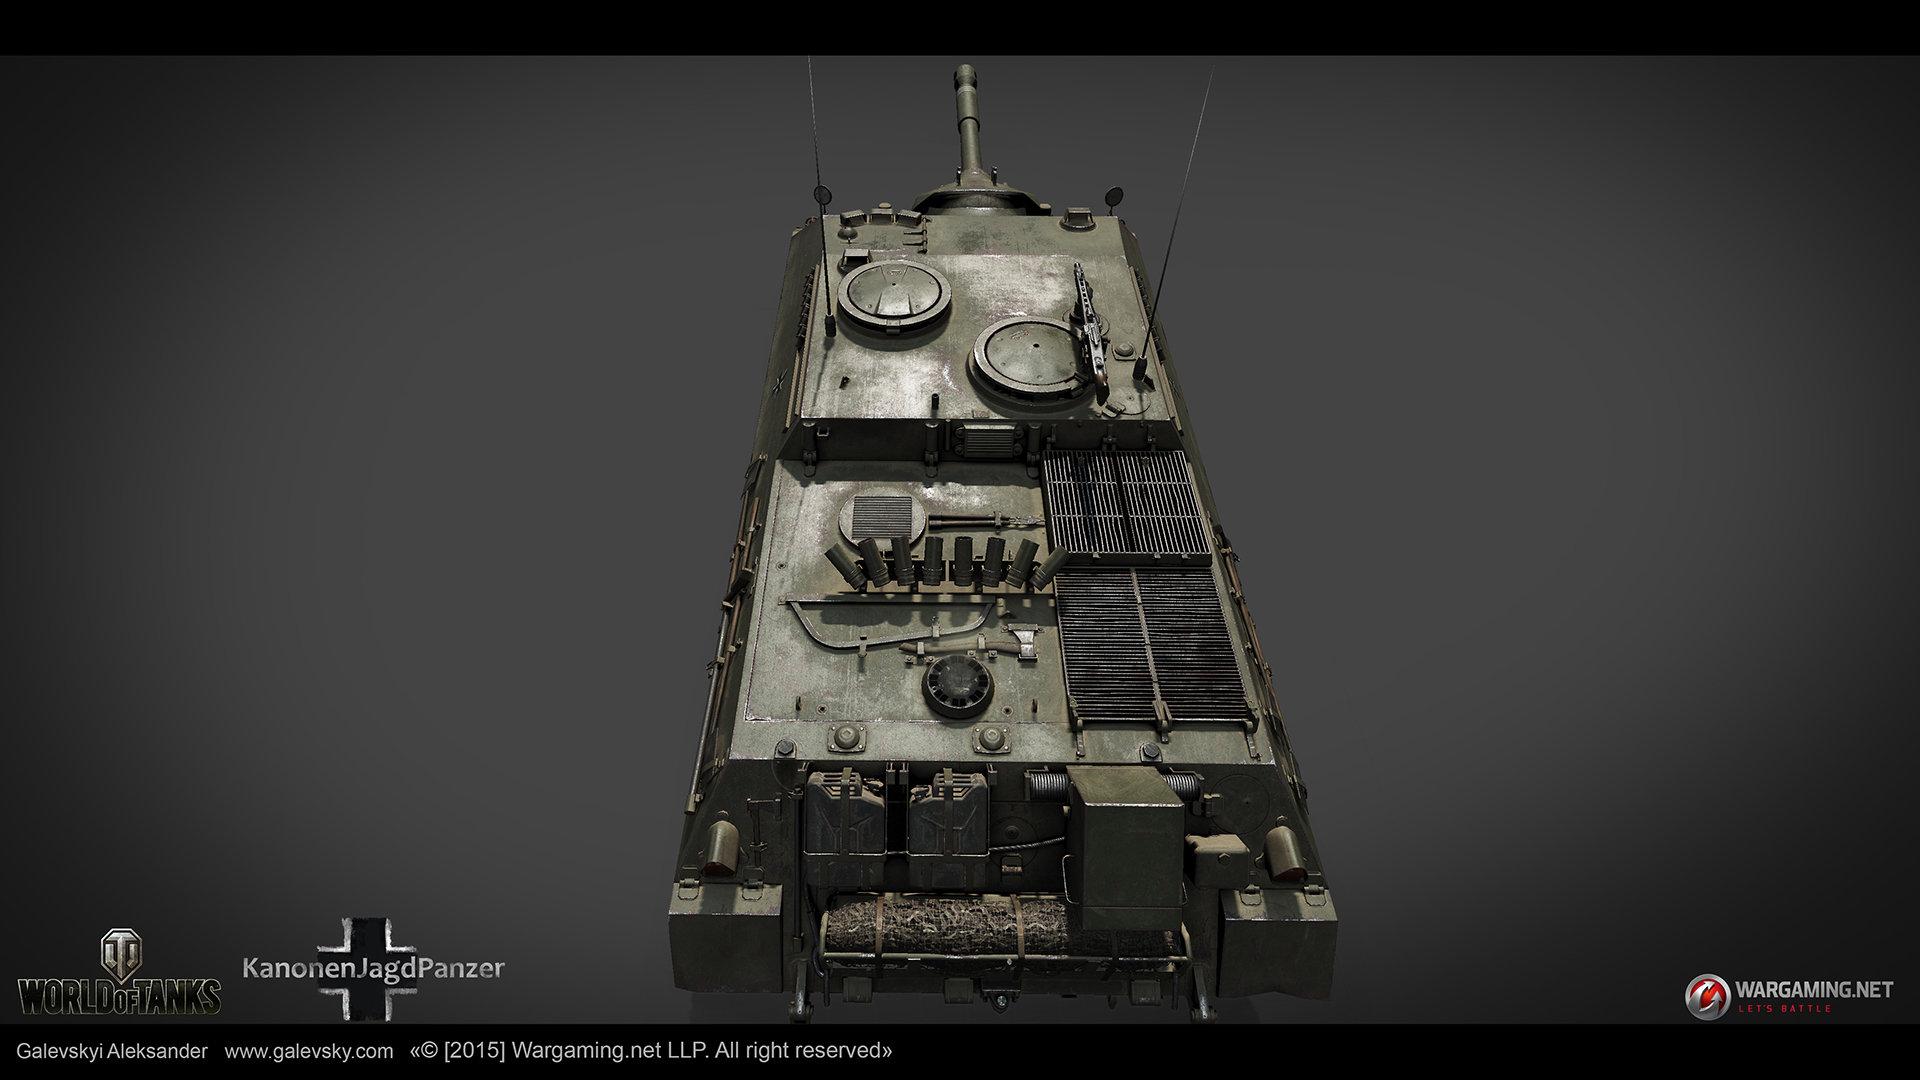 Aleksander galevskyi kanonenjagdpanzer fin small 08